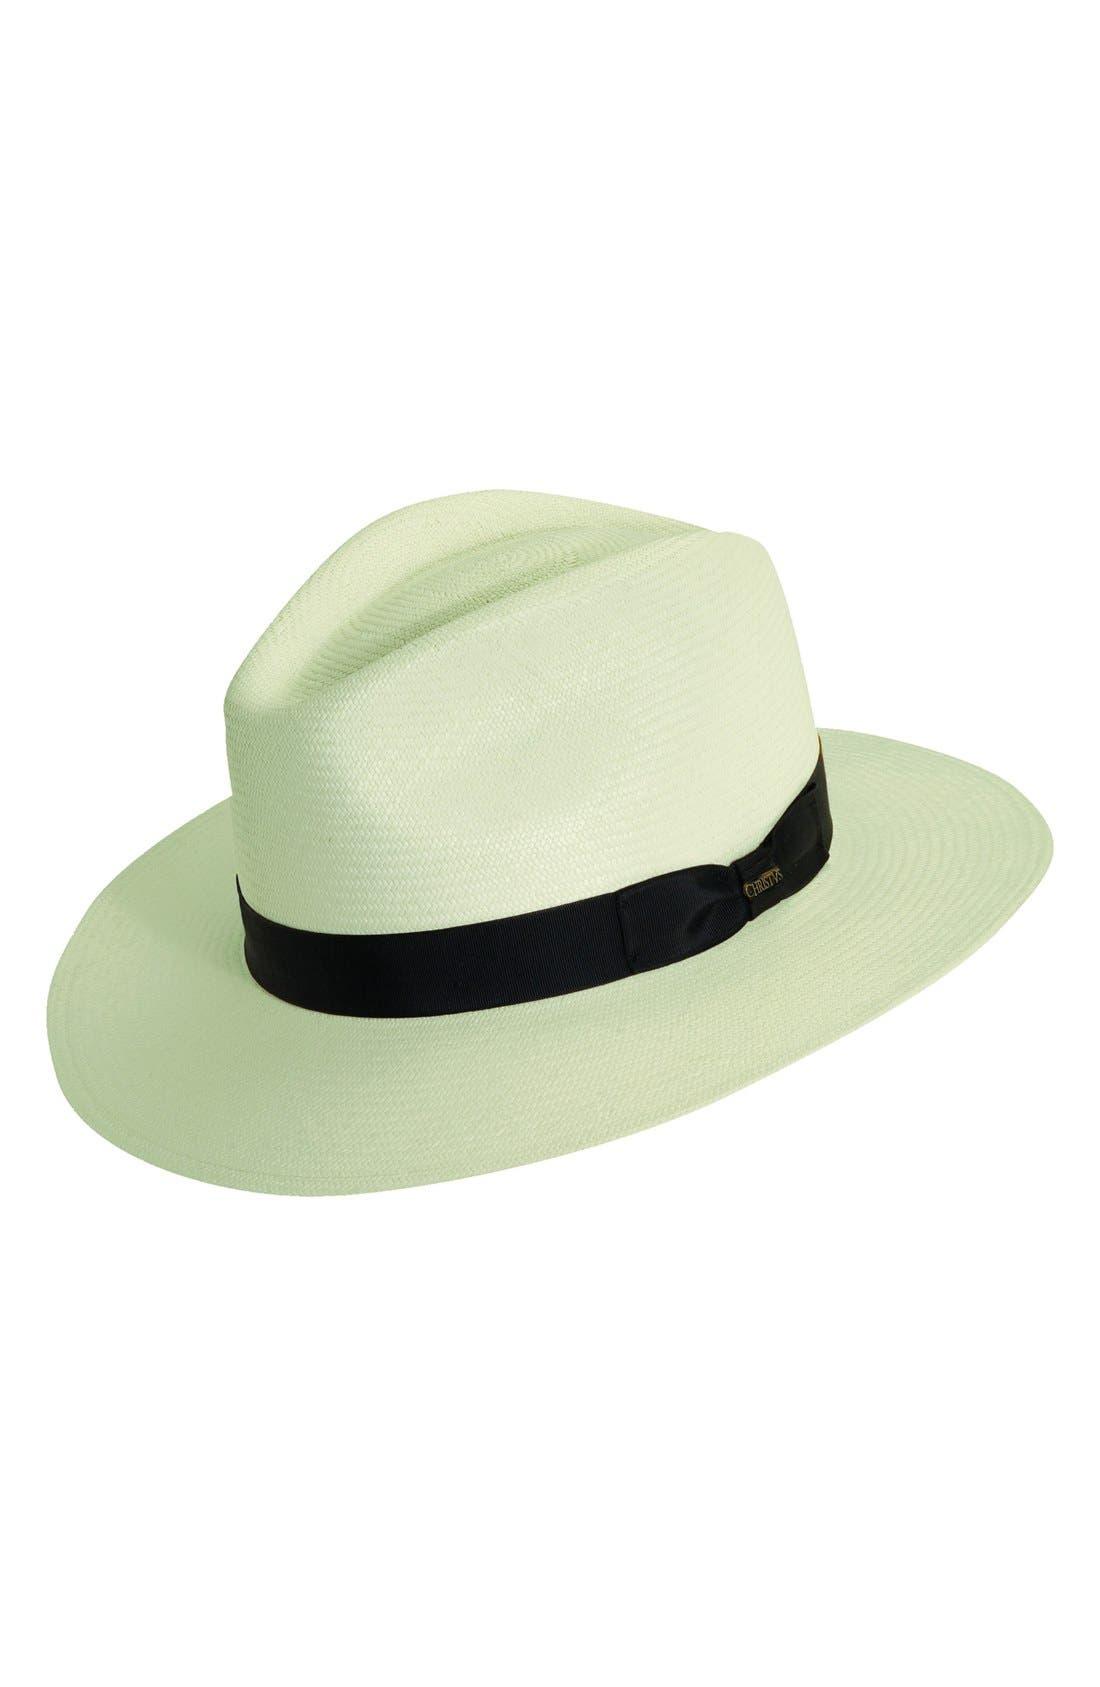 Main Image - Christy's London Panama Straw Safari Hat